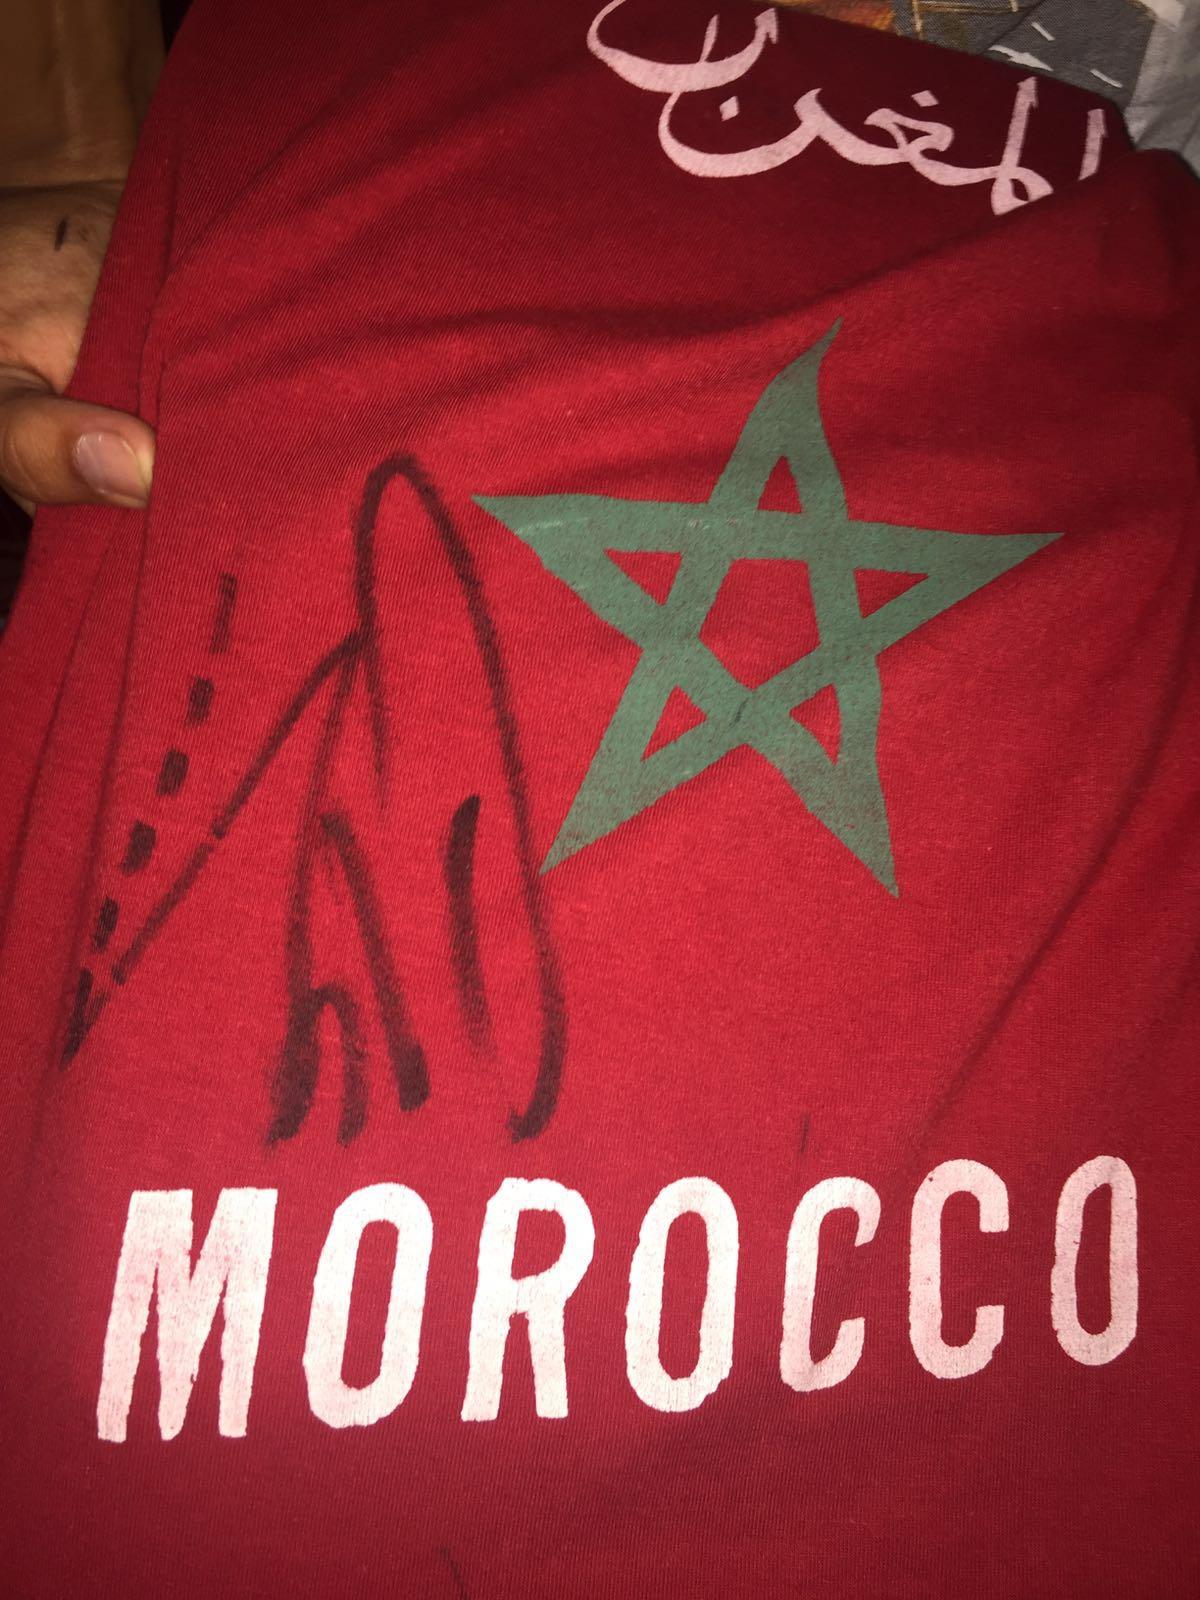 Autógrafo en la camiseta de Marruecos del jugador del Real Madrid (Foto: Fútbol PItiuso).